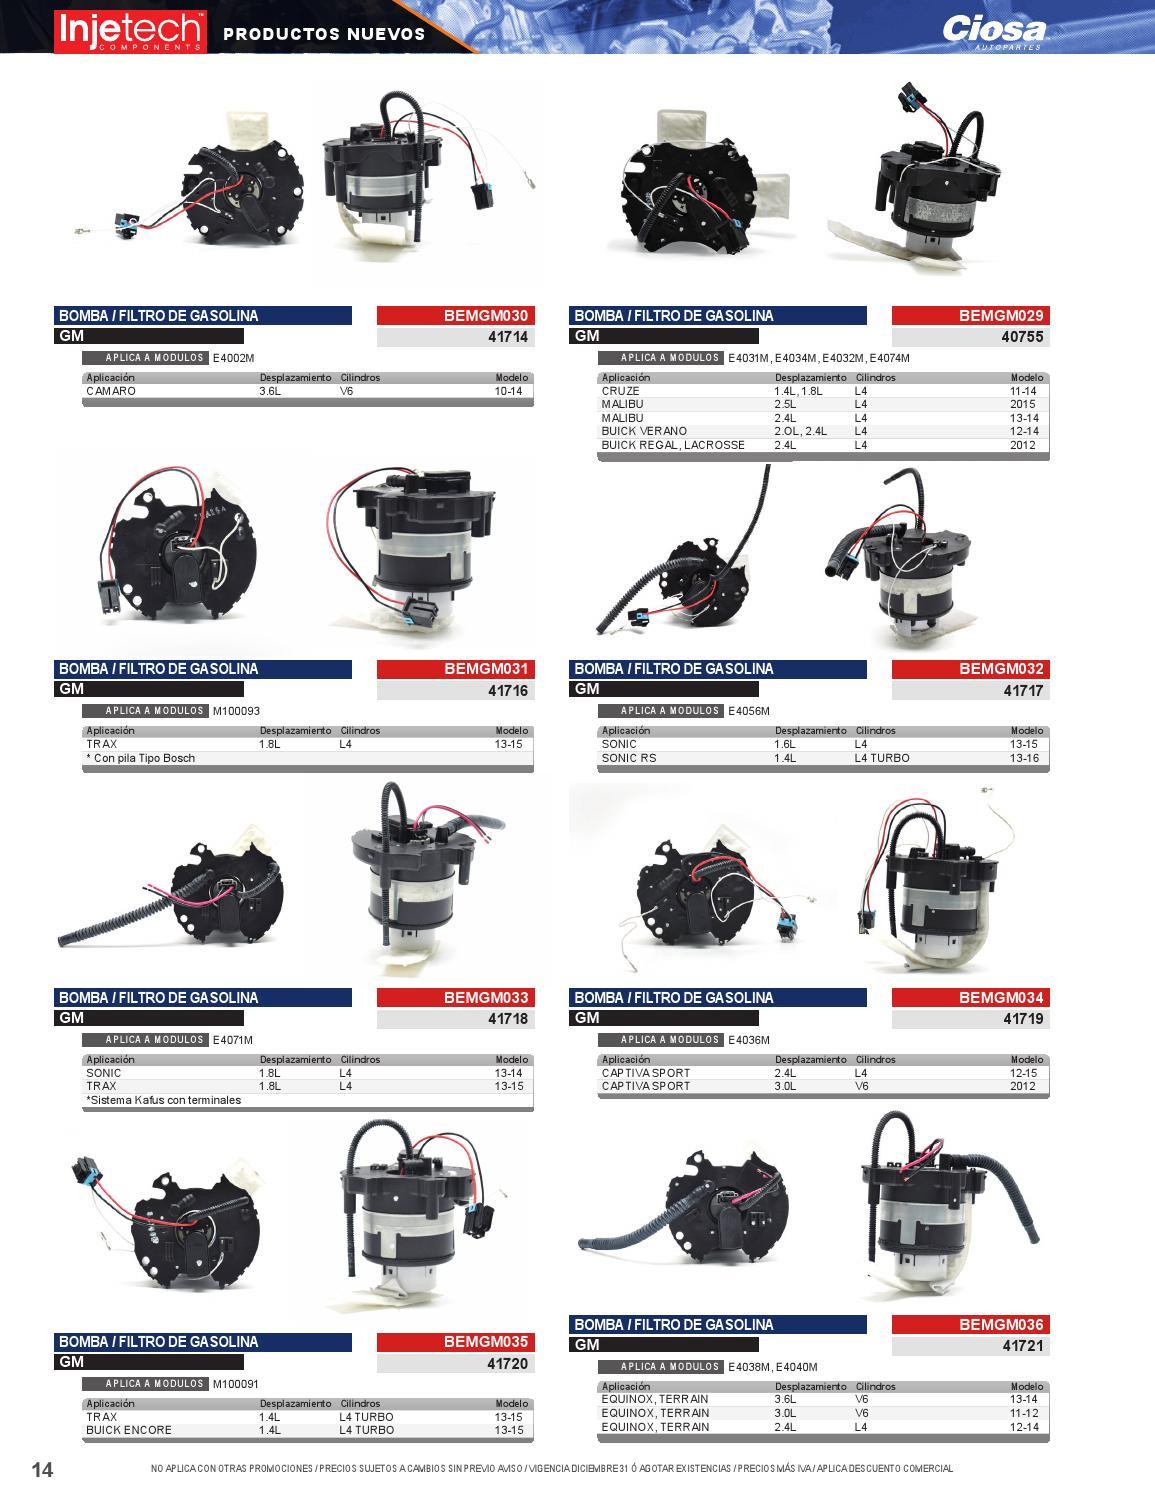 Elementos de la Blic 6502-07-0552994Q Parachoques